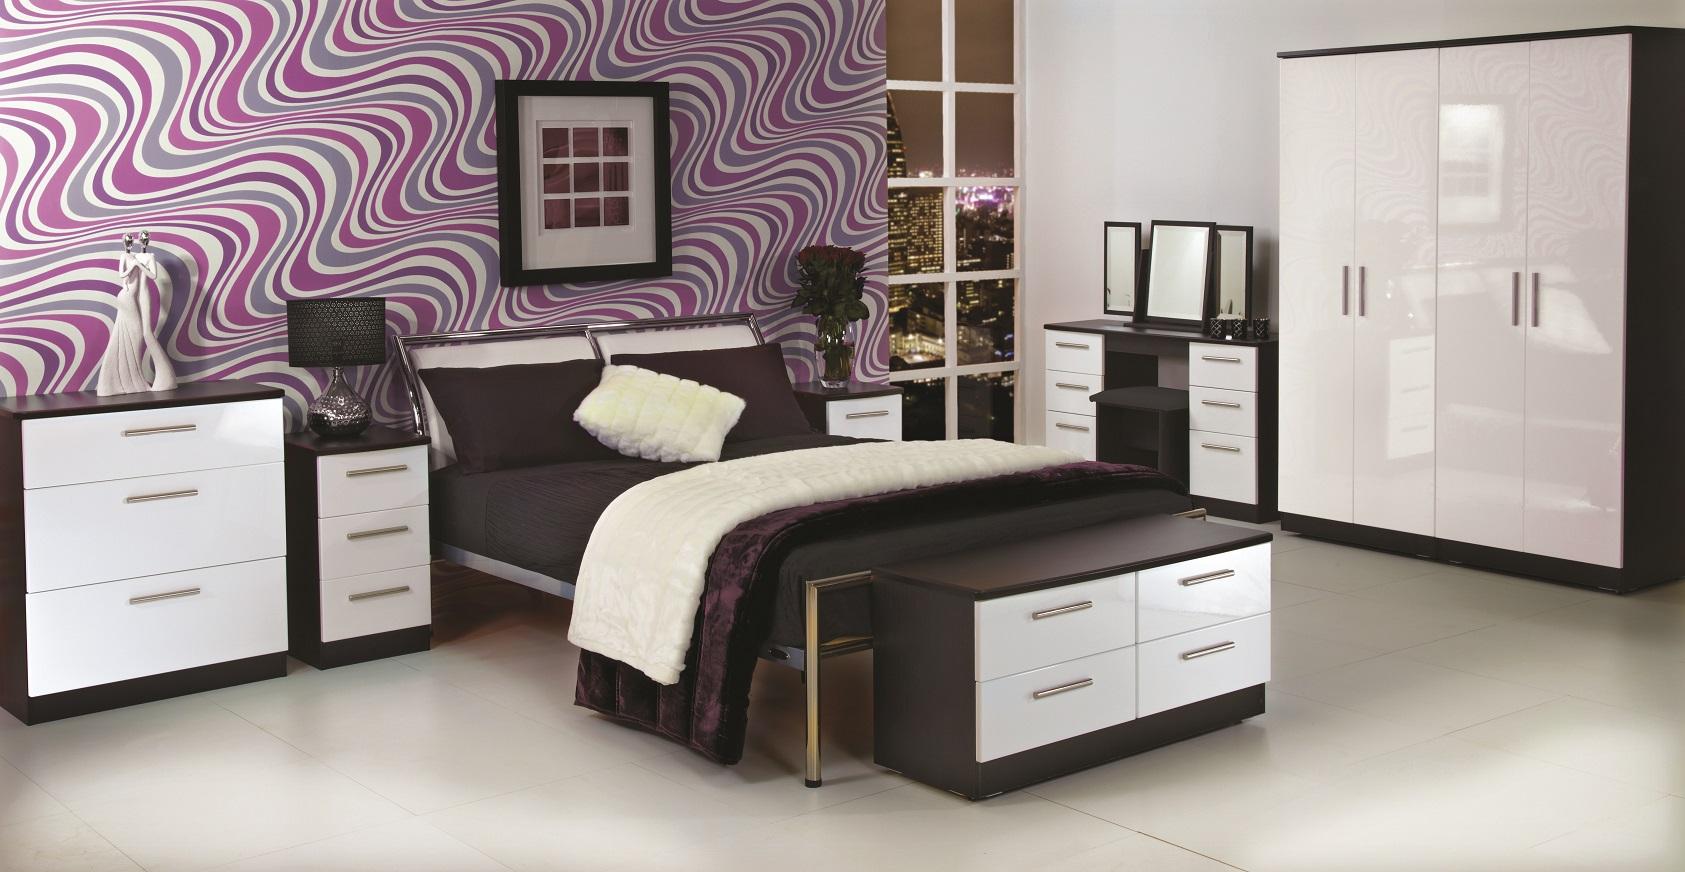 Coytes knightsbridge for Knightsbridge bedroom furniture